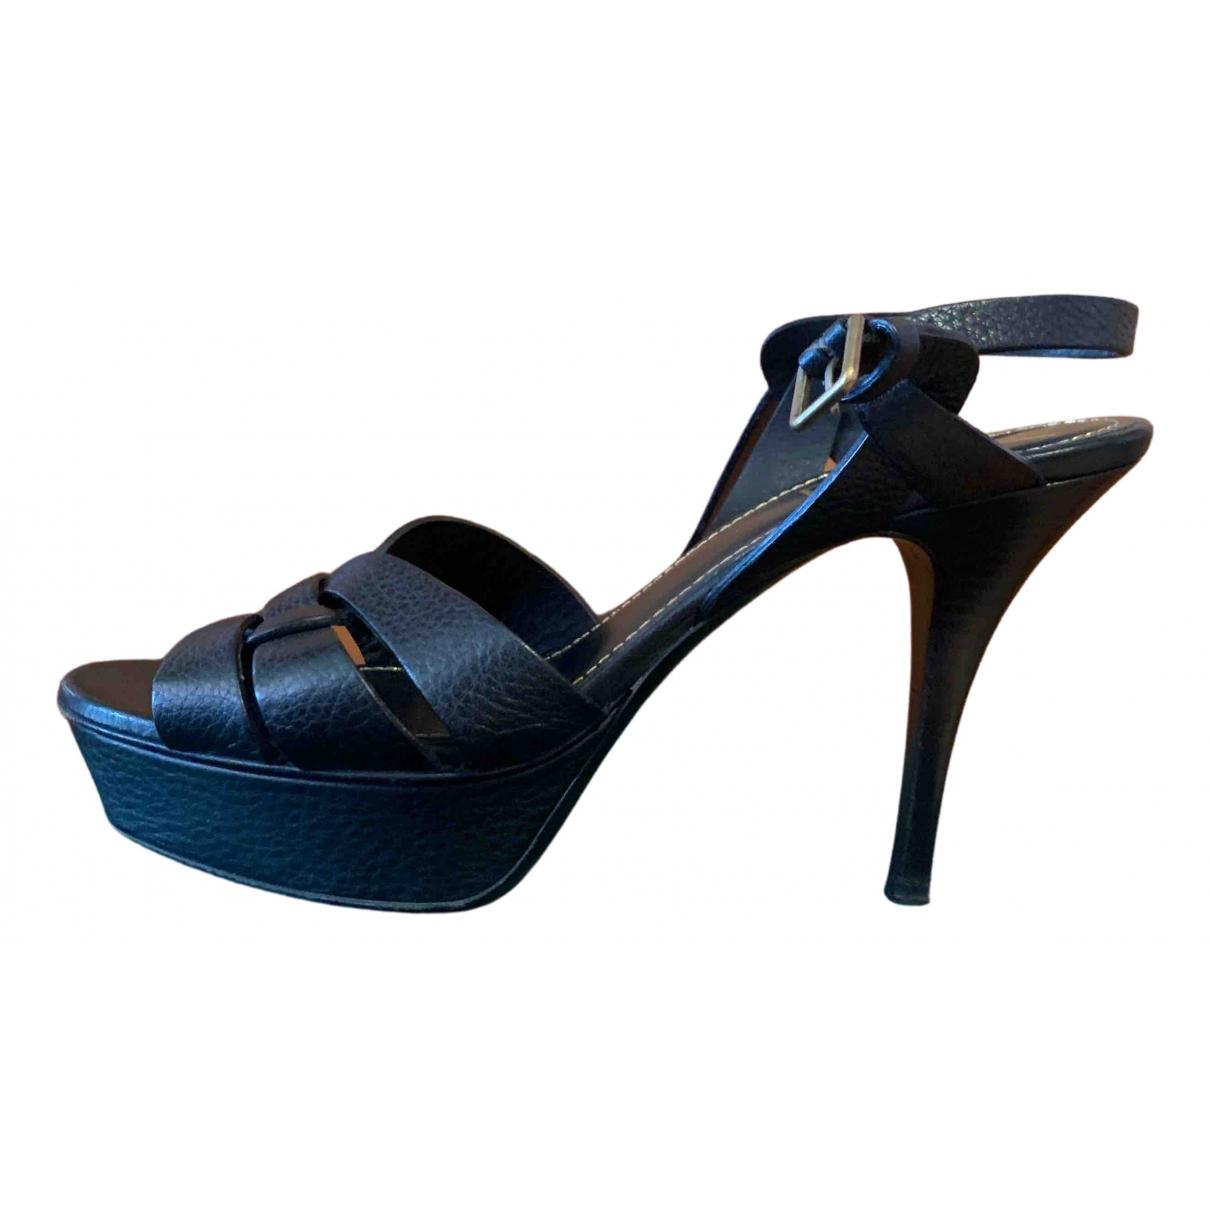 Yves Saint Laurent Tribute Black Leather Sandals for Women 39 EU